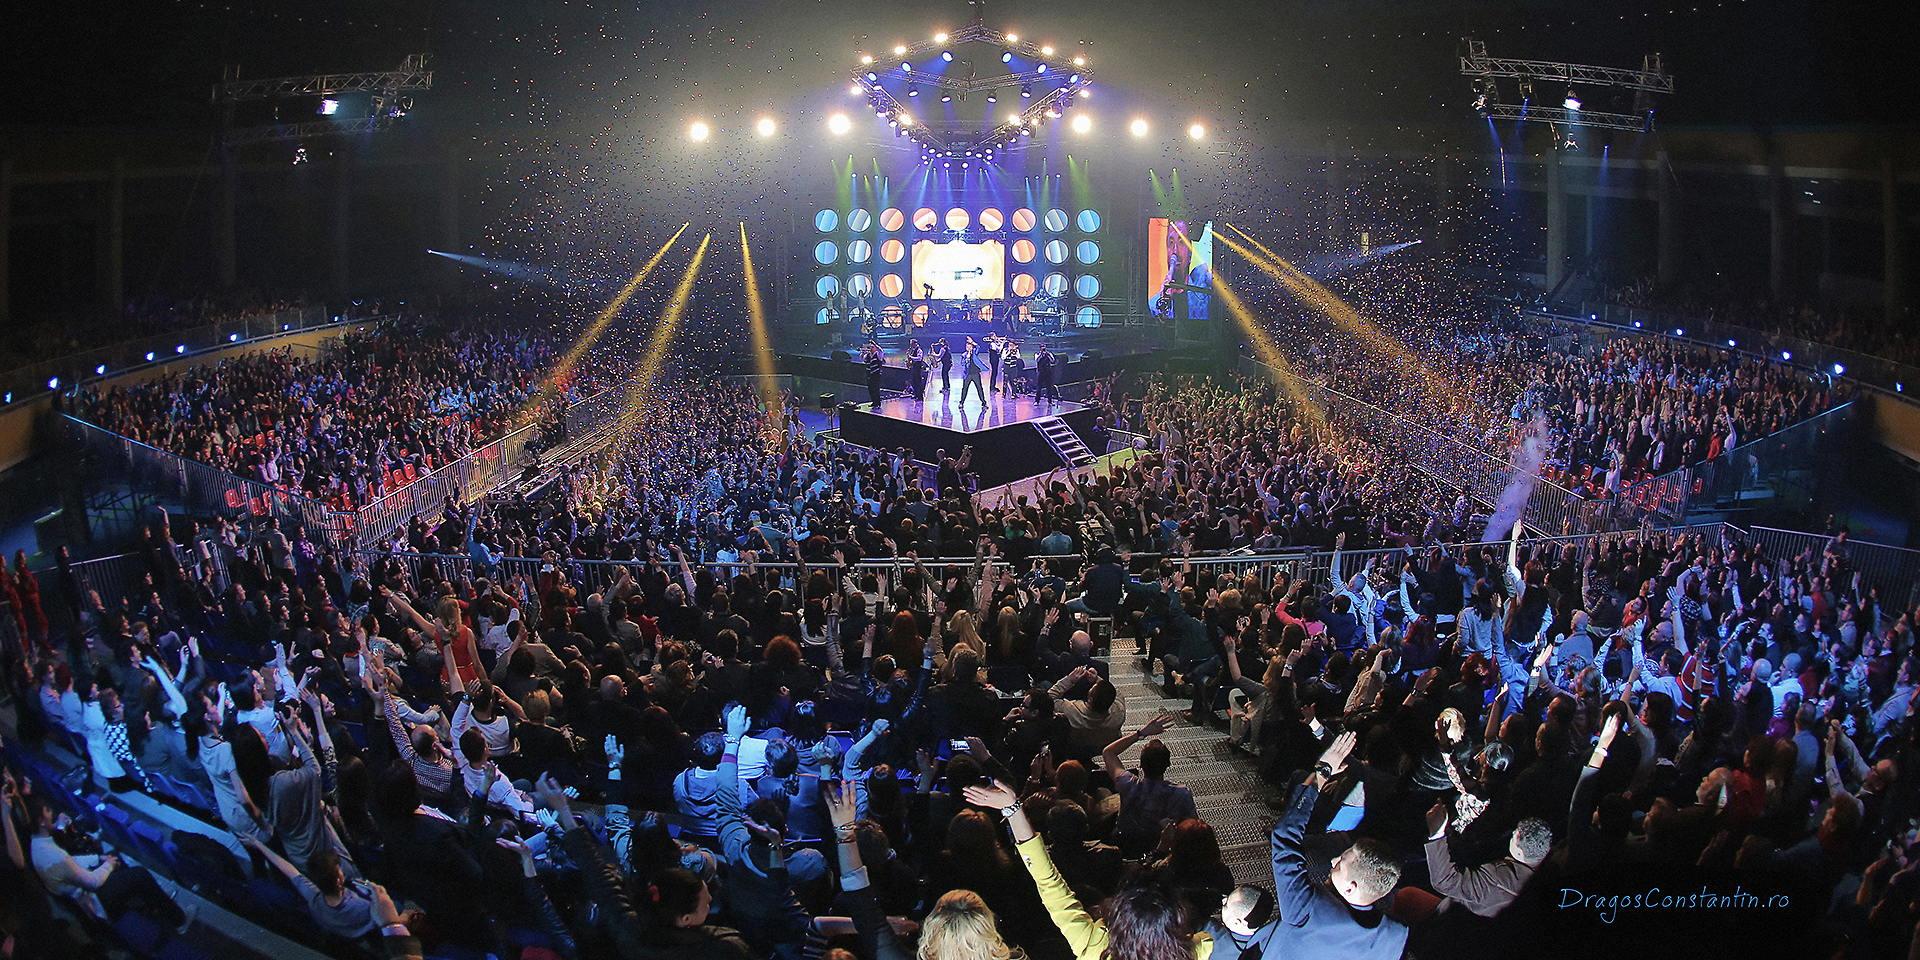 Fotografie Eveniment Corporate - Concert Brenciu Romexpo